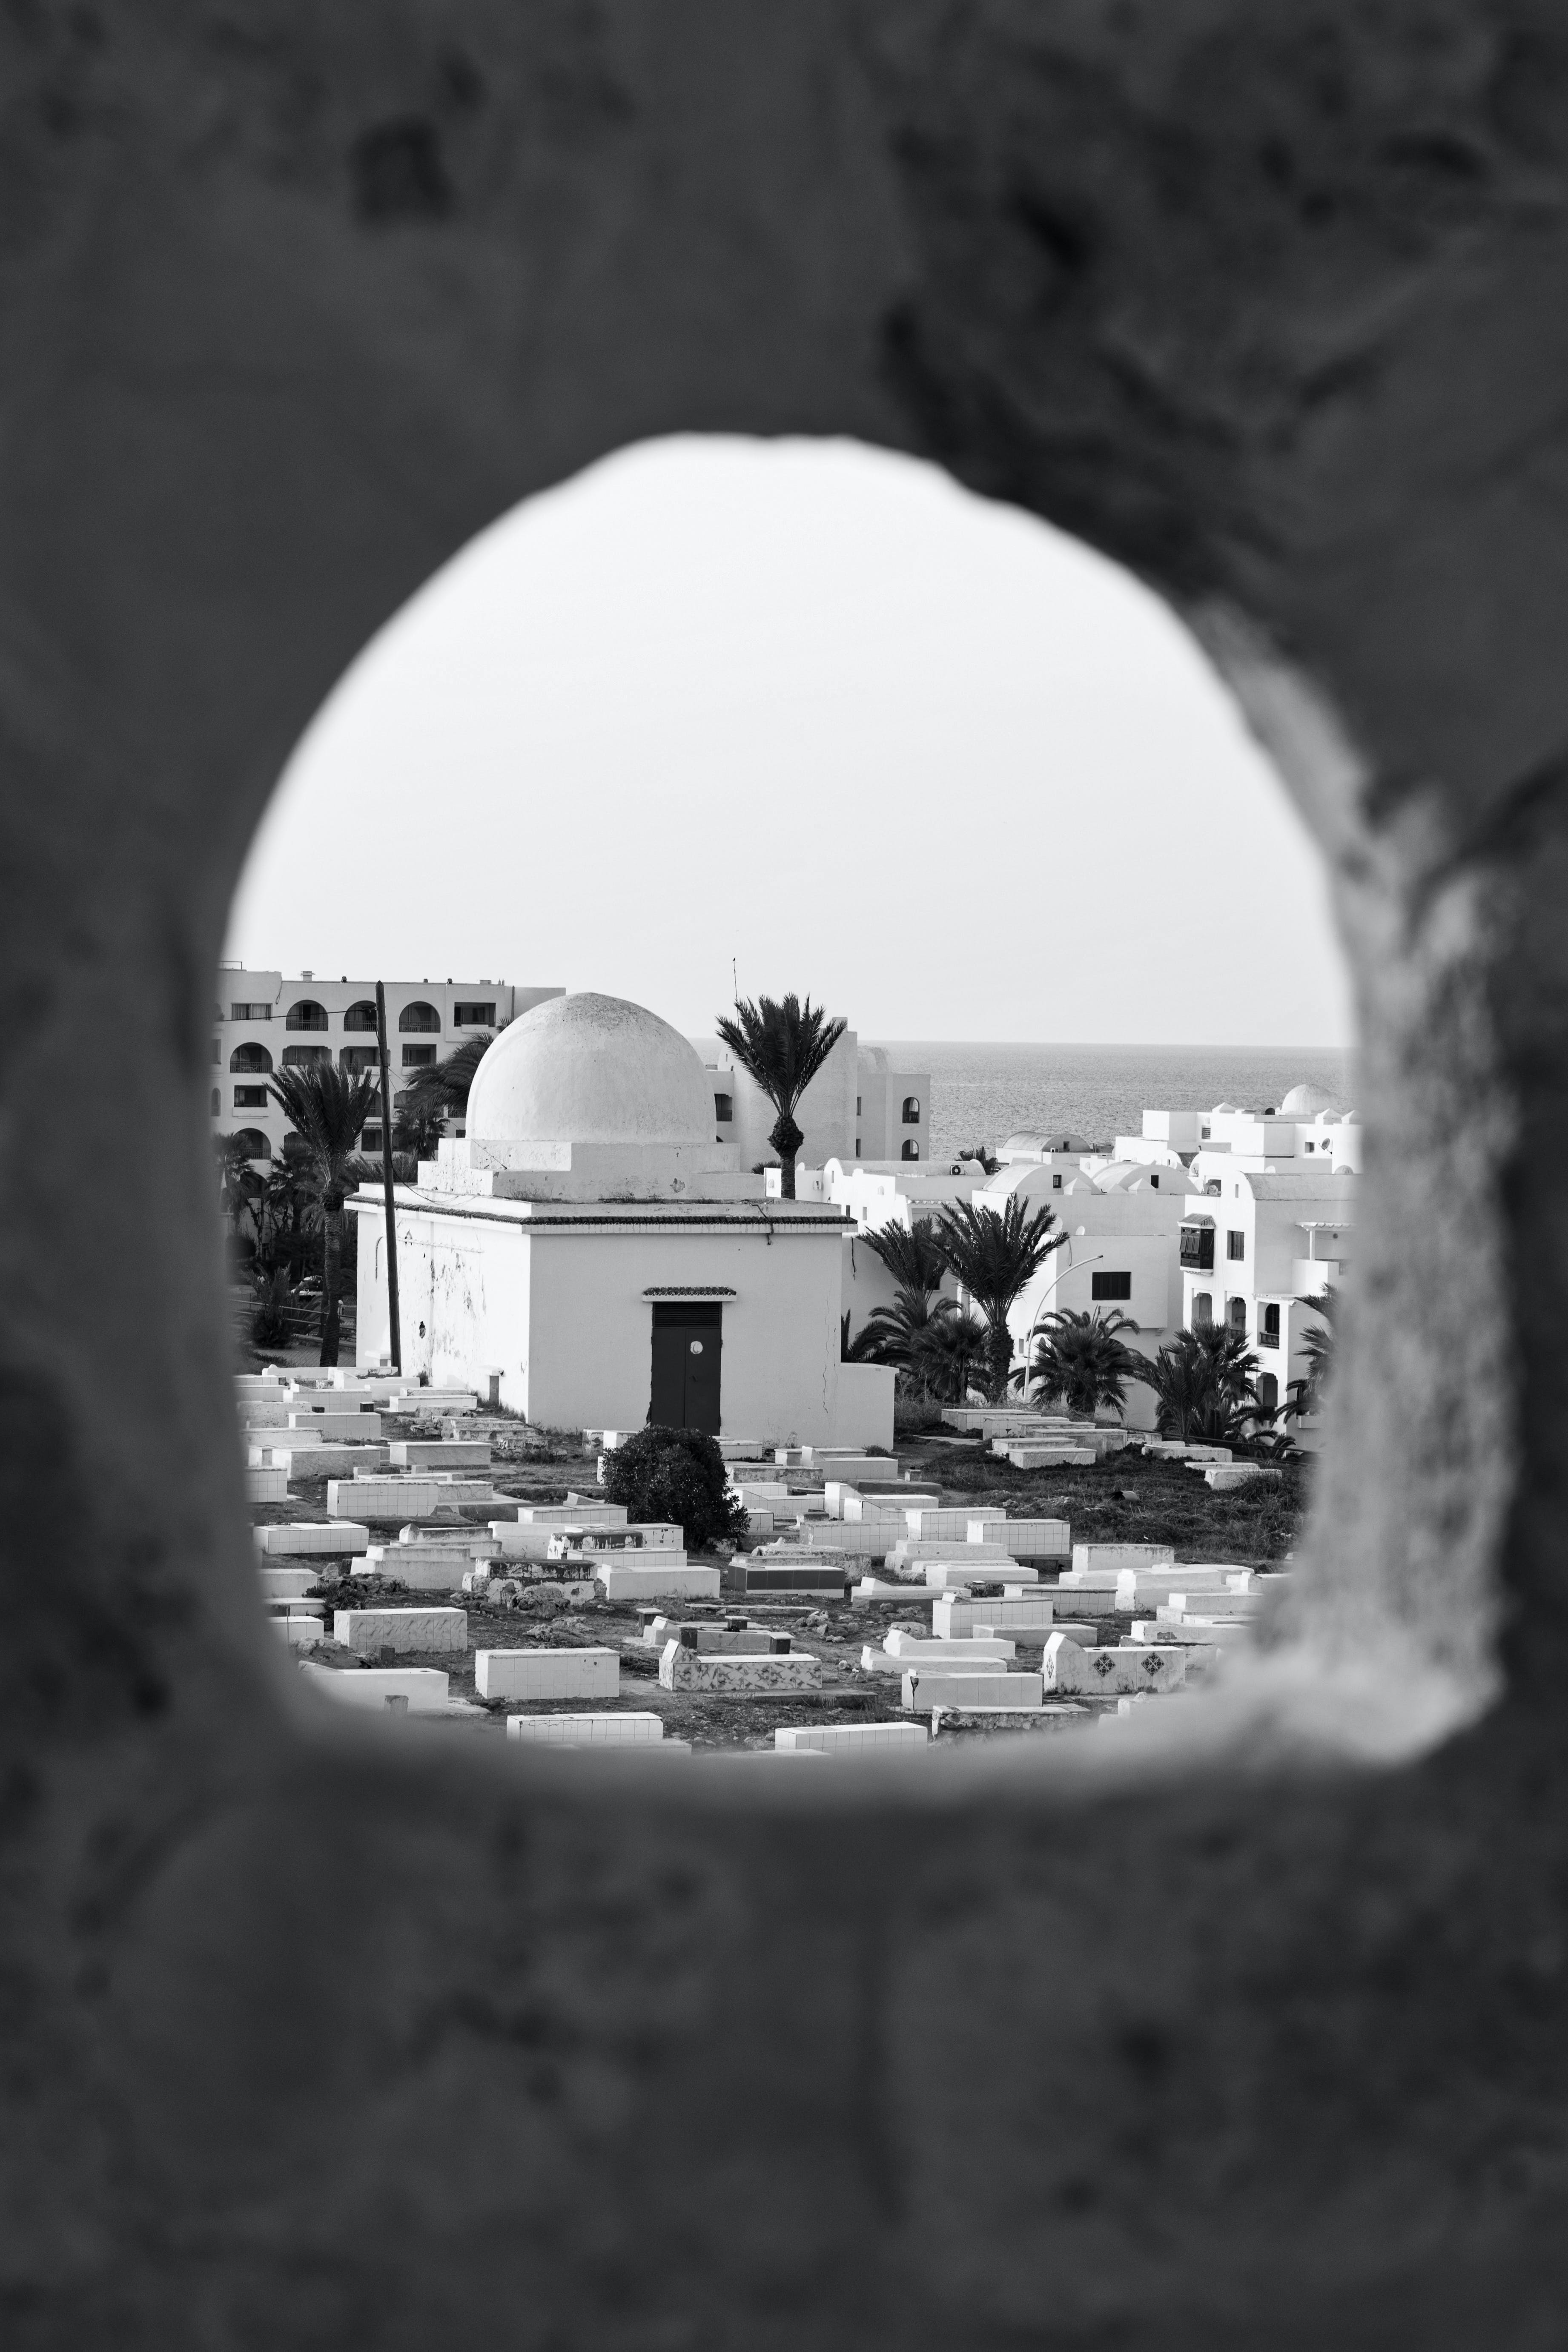 architecture, black and white, black-and-white